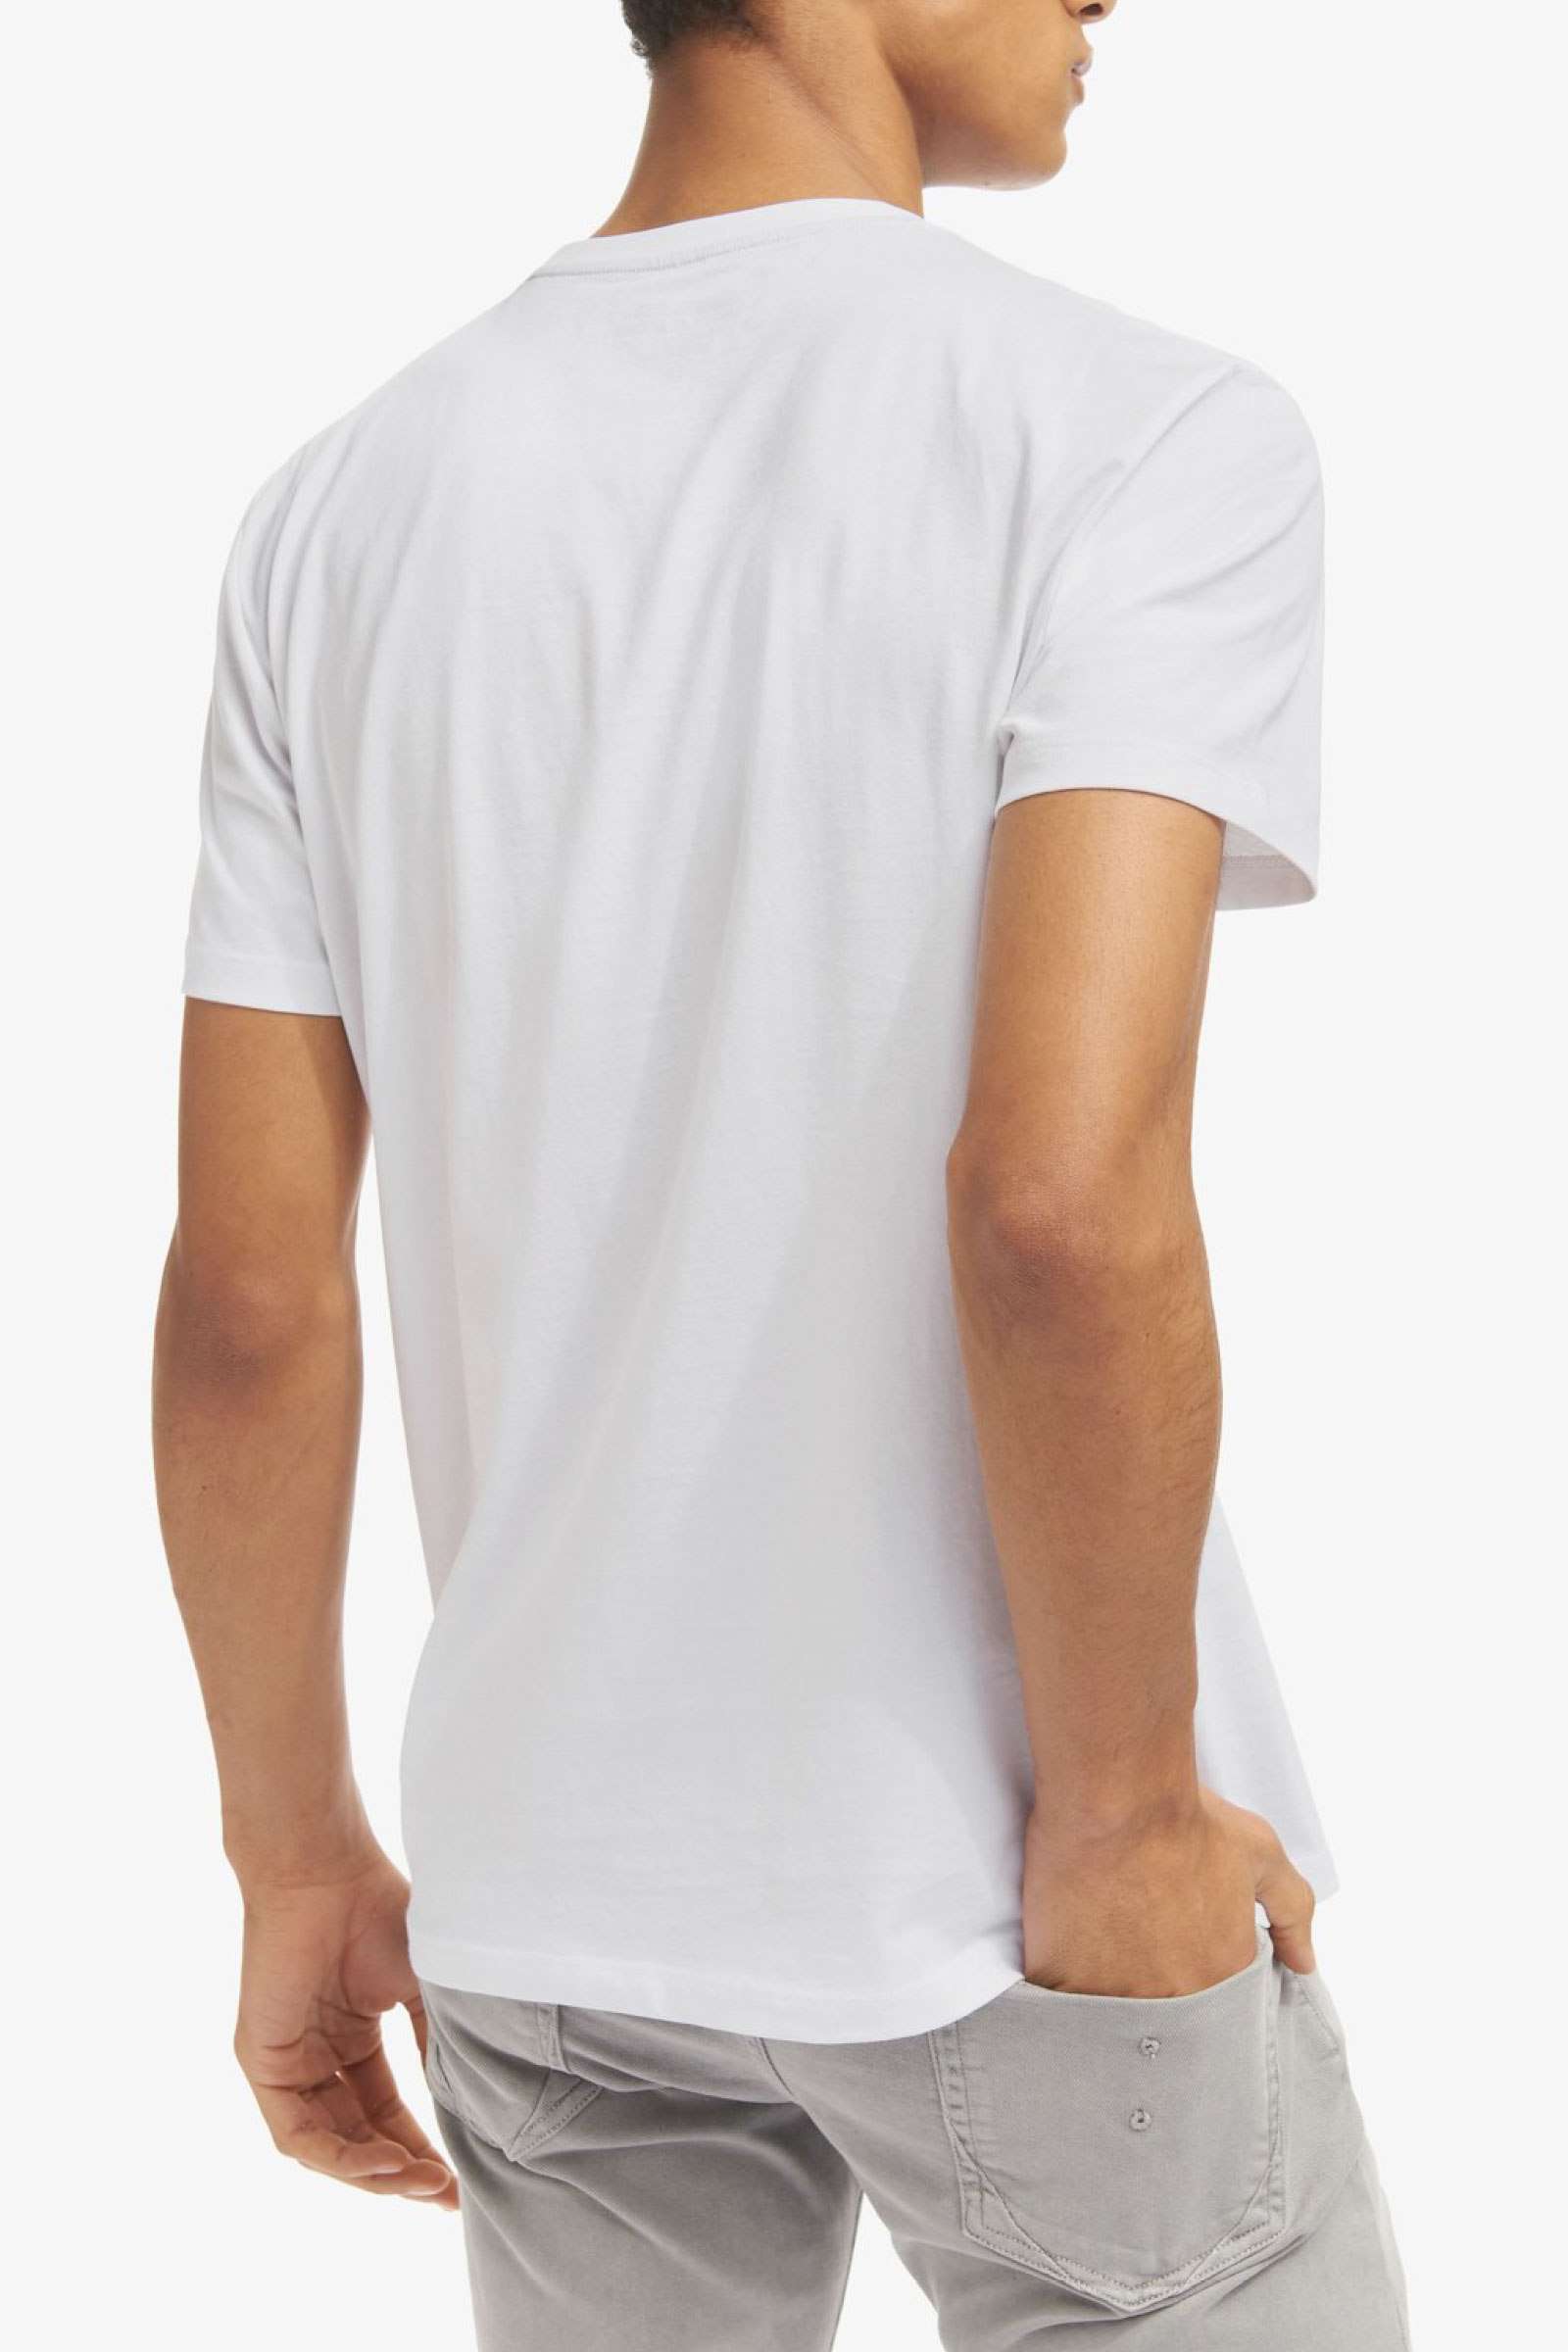 BLAUER T-Shirt Uomo BLAUER   T-Shirt   21SBLUH02133100